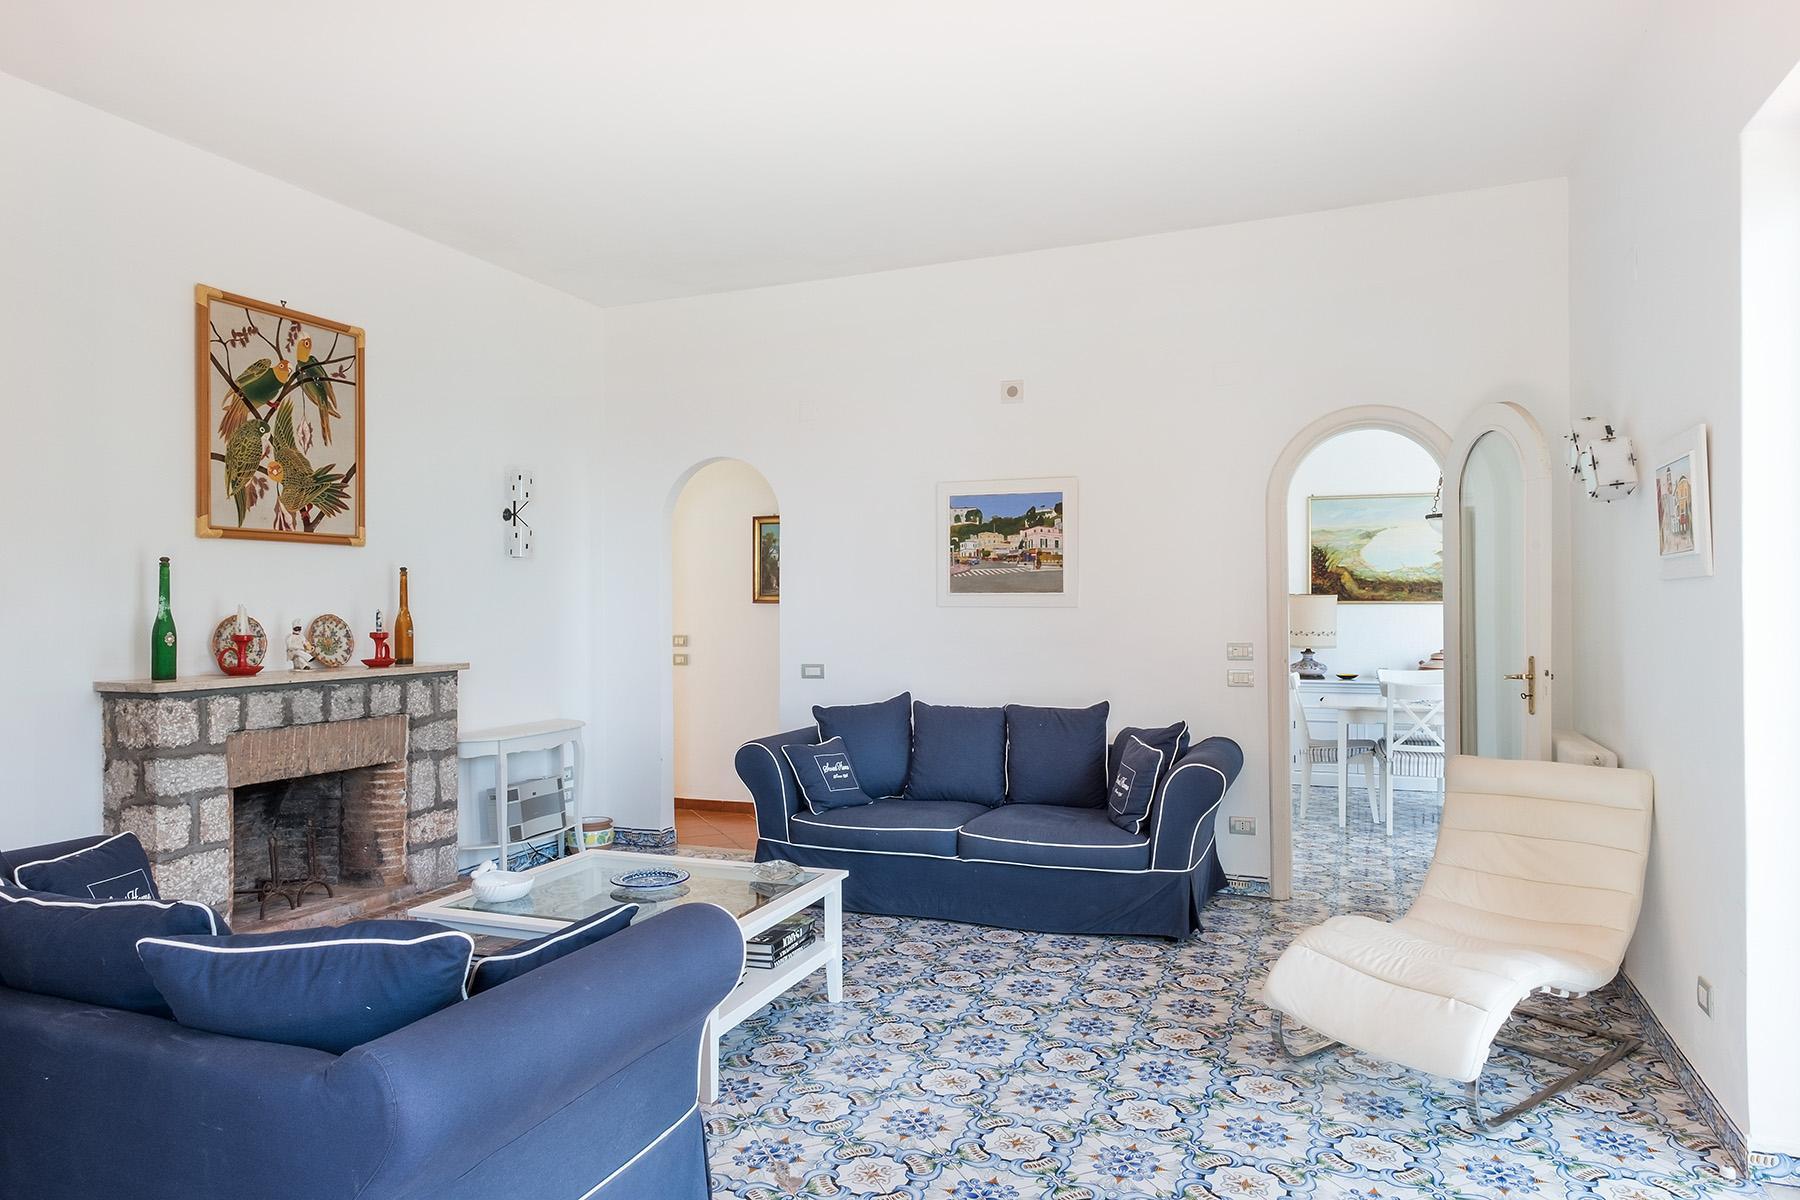 Прекрасная вилла с панорамным видом на море в центре легендарного острова Капри, Италия - 8